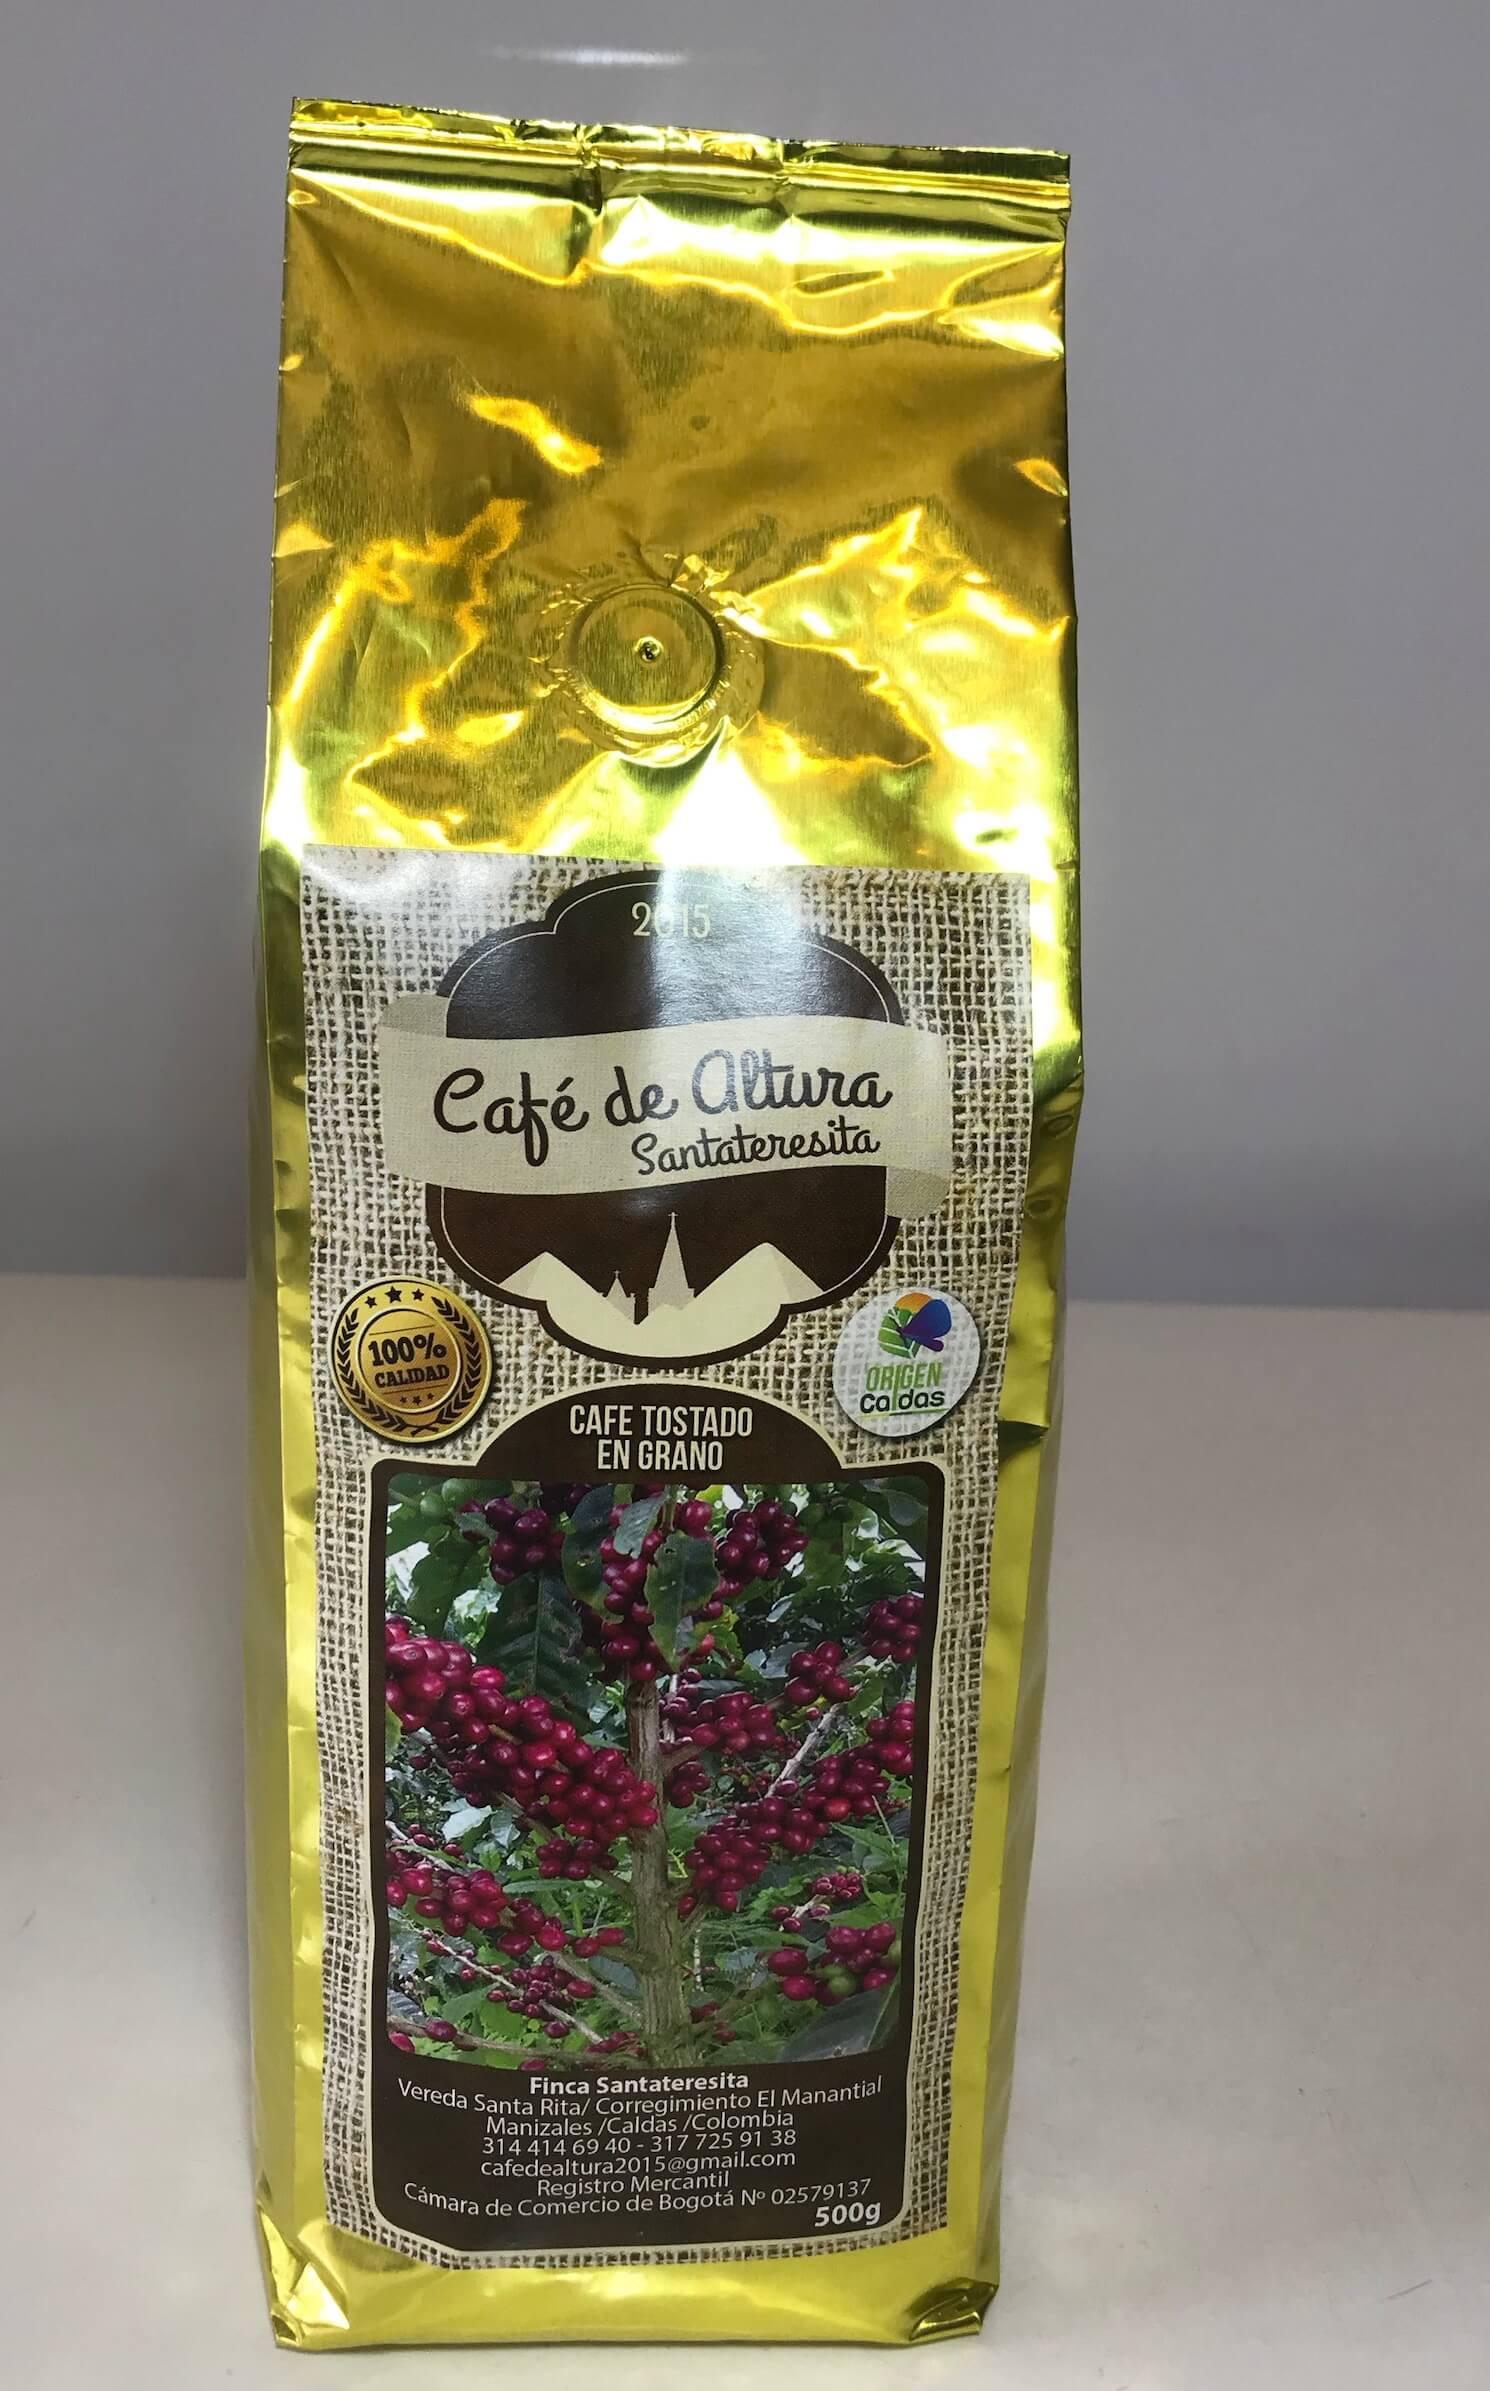 Café-de-altura-Santa-teresita-tostado-y-grano-x-500-gr.jpeg